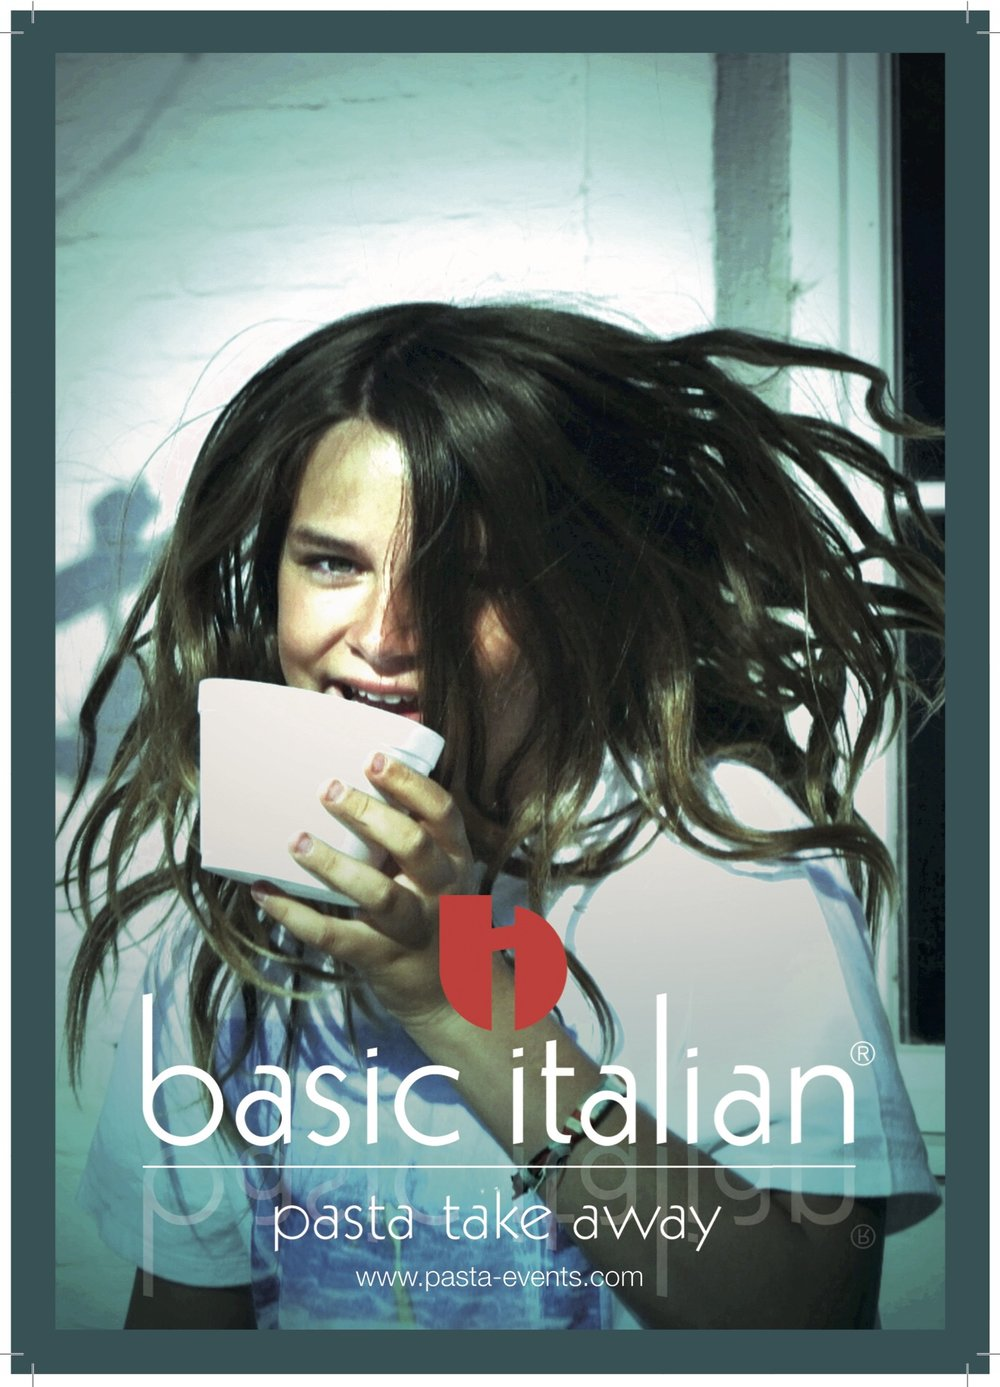 Basic Italian Logo 2015 kopie 2.jpg